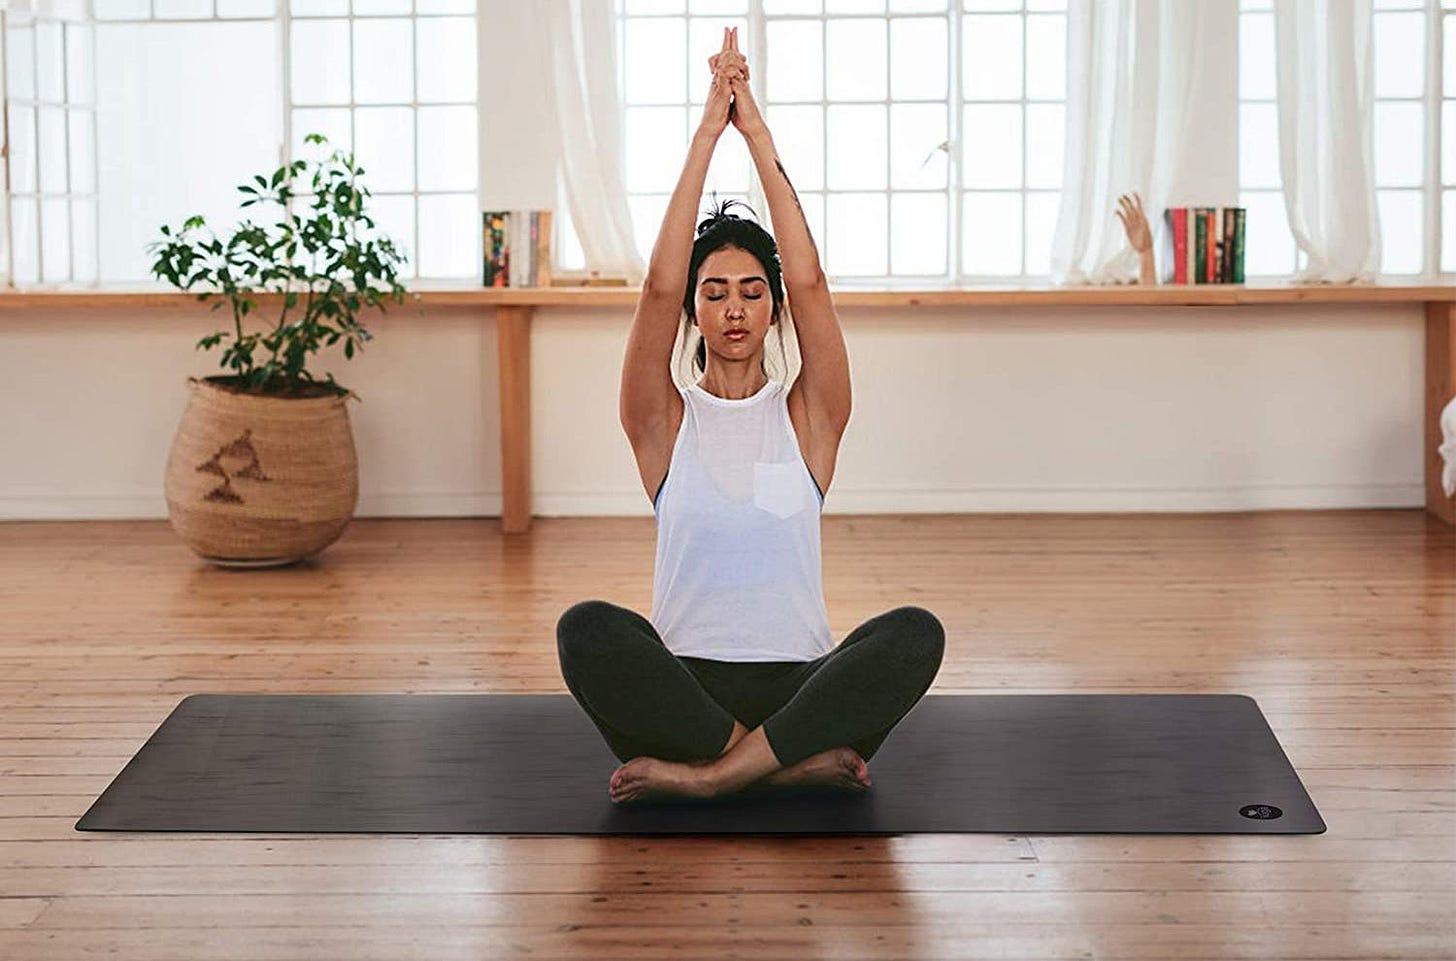 Top 10 Best Yoga Mats under $100 in 2021 Reviews » MyBestSpec